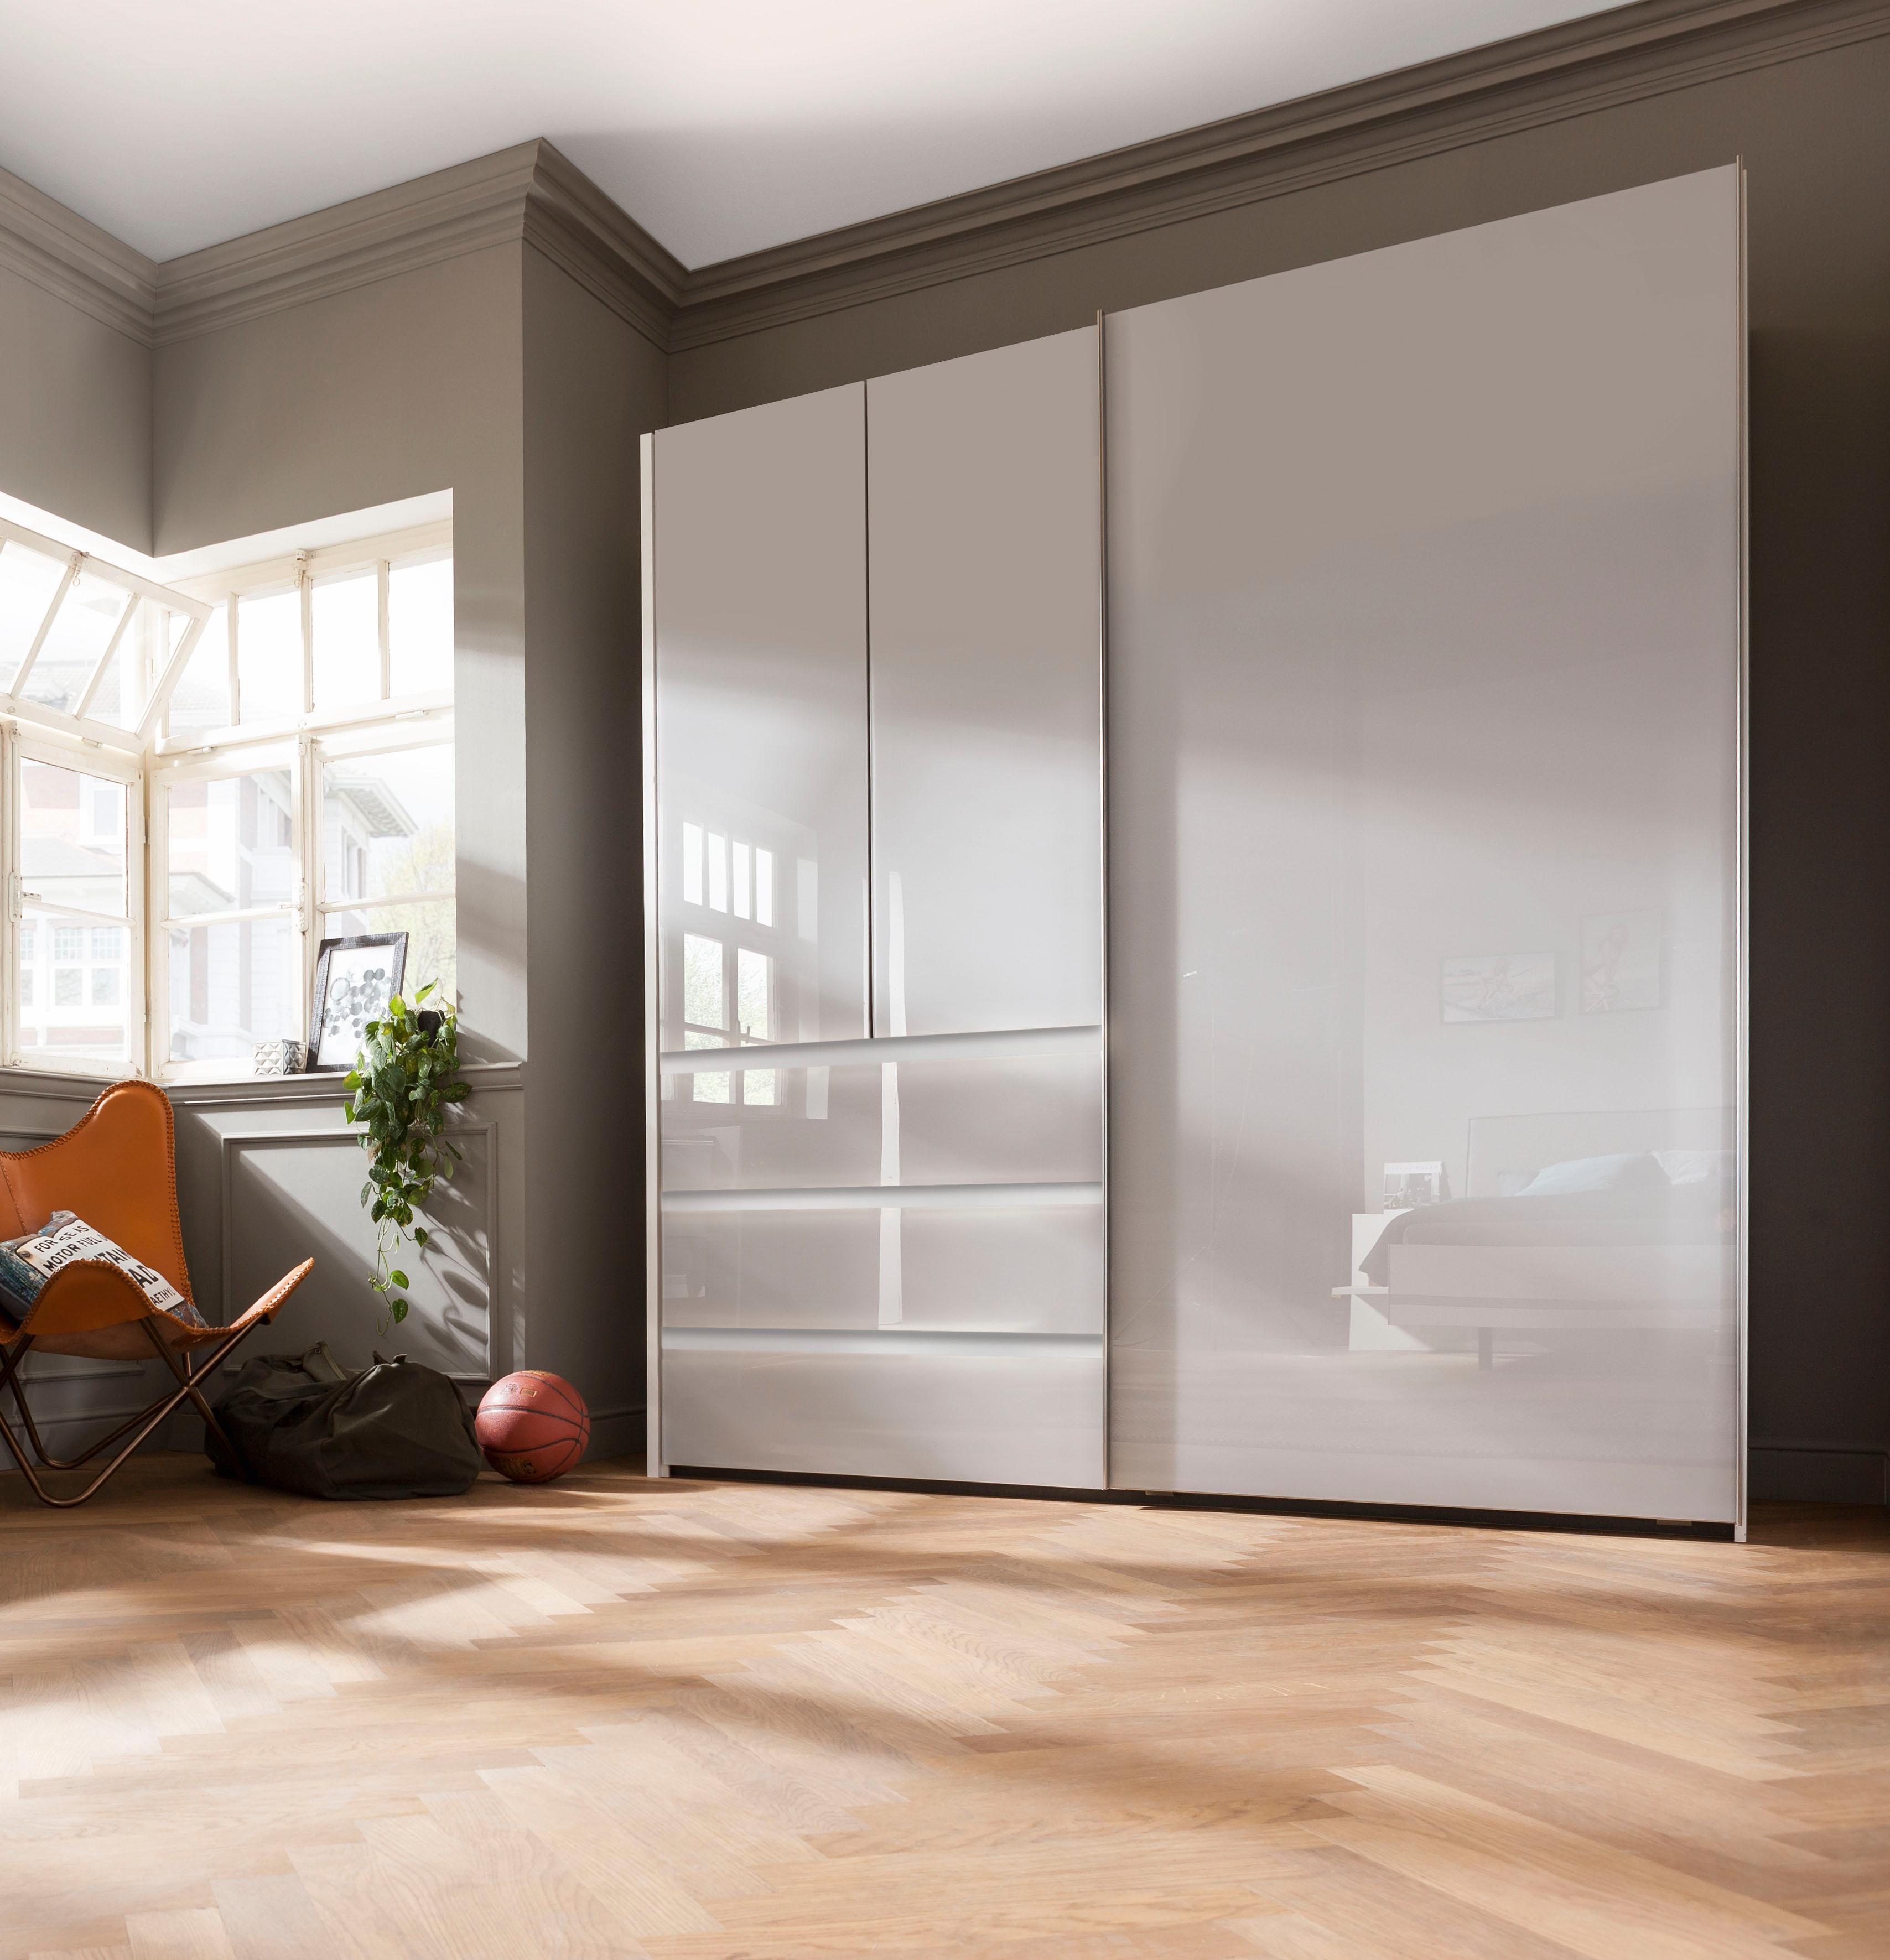 nolte® Möbel Schwebetürenschrank »concept me 320« bestellen | BAUR